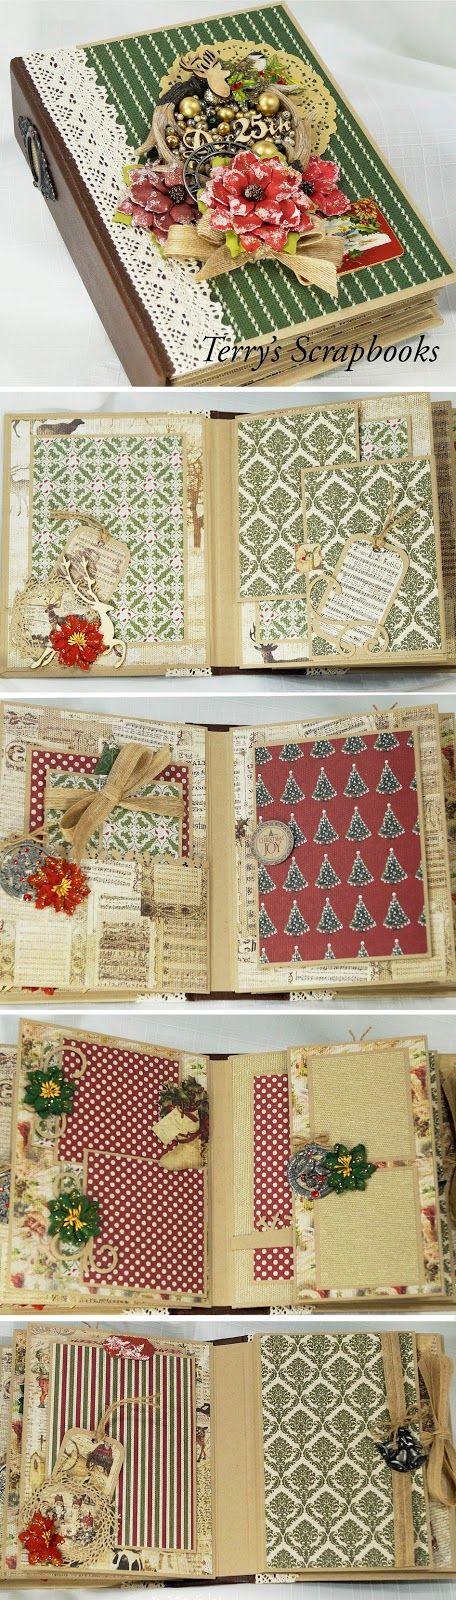 Terry's Scrapbooks: Fabscraps - Christmas joy Mini Album